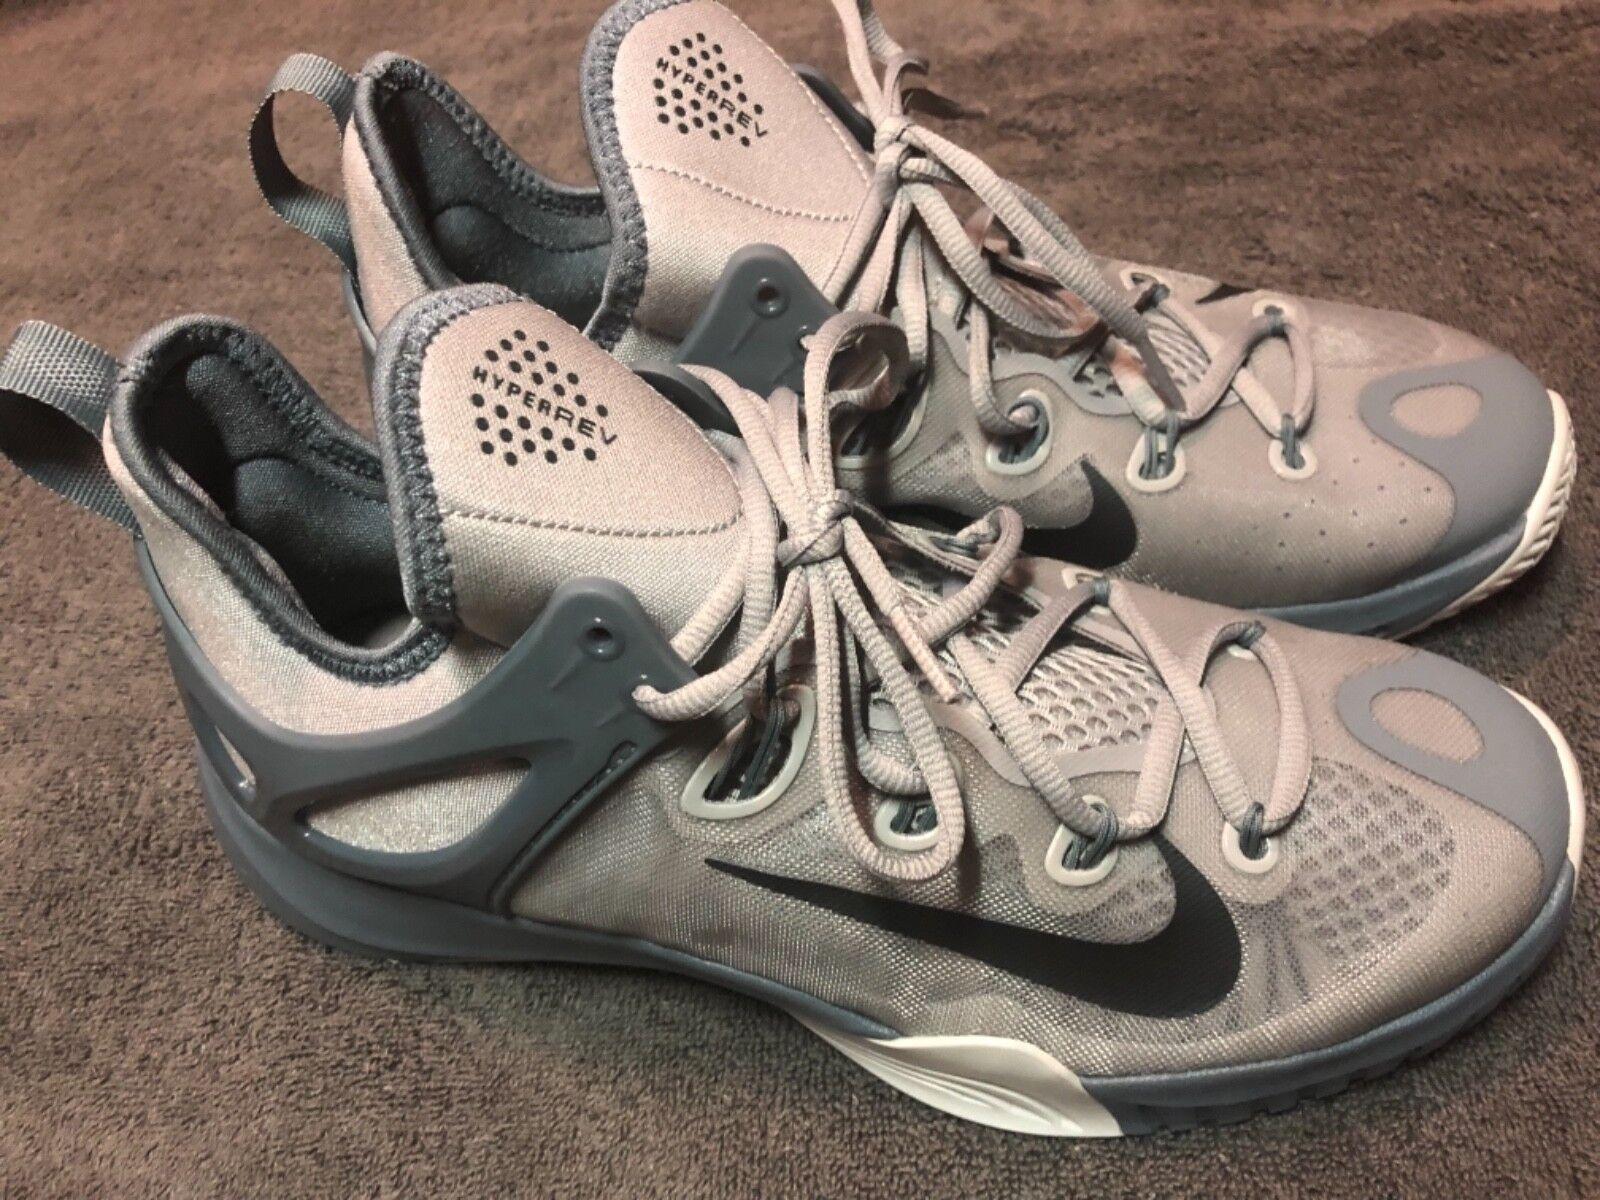 Uomo Nike Zoom HyperRev 2015 Basketball Shoes (705370 040) 040) 040) Wolf Grey - Size 9 9fb16b